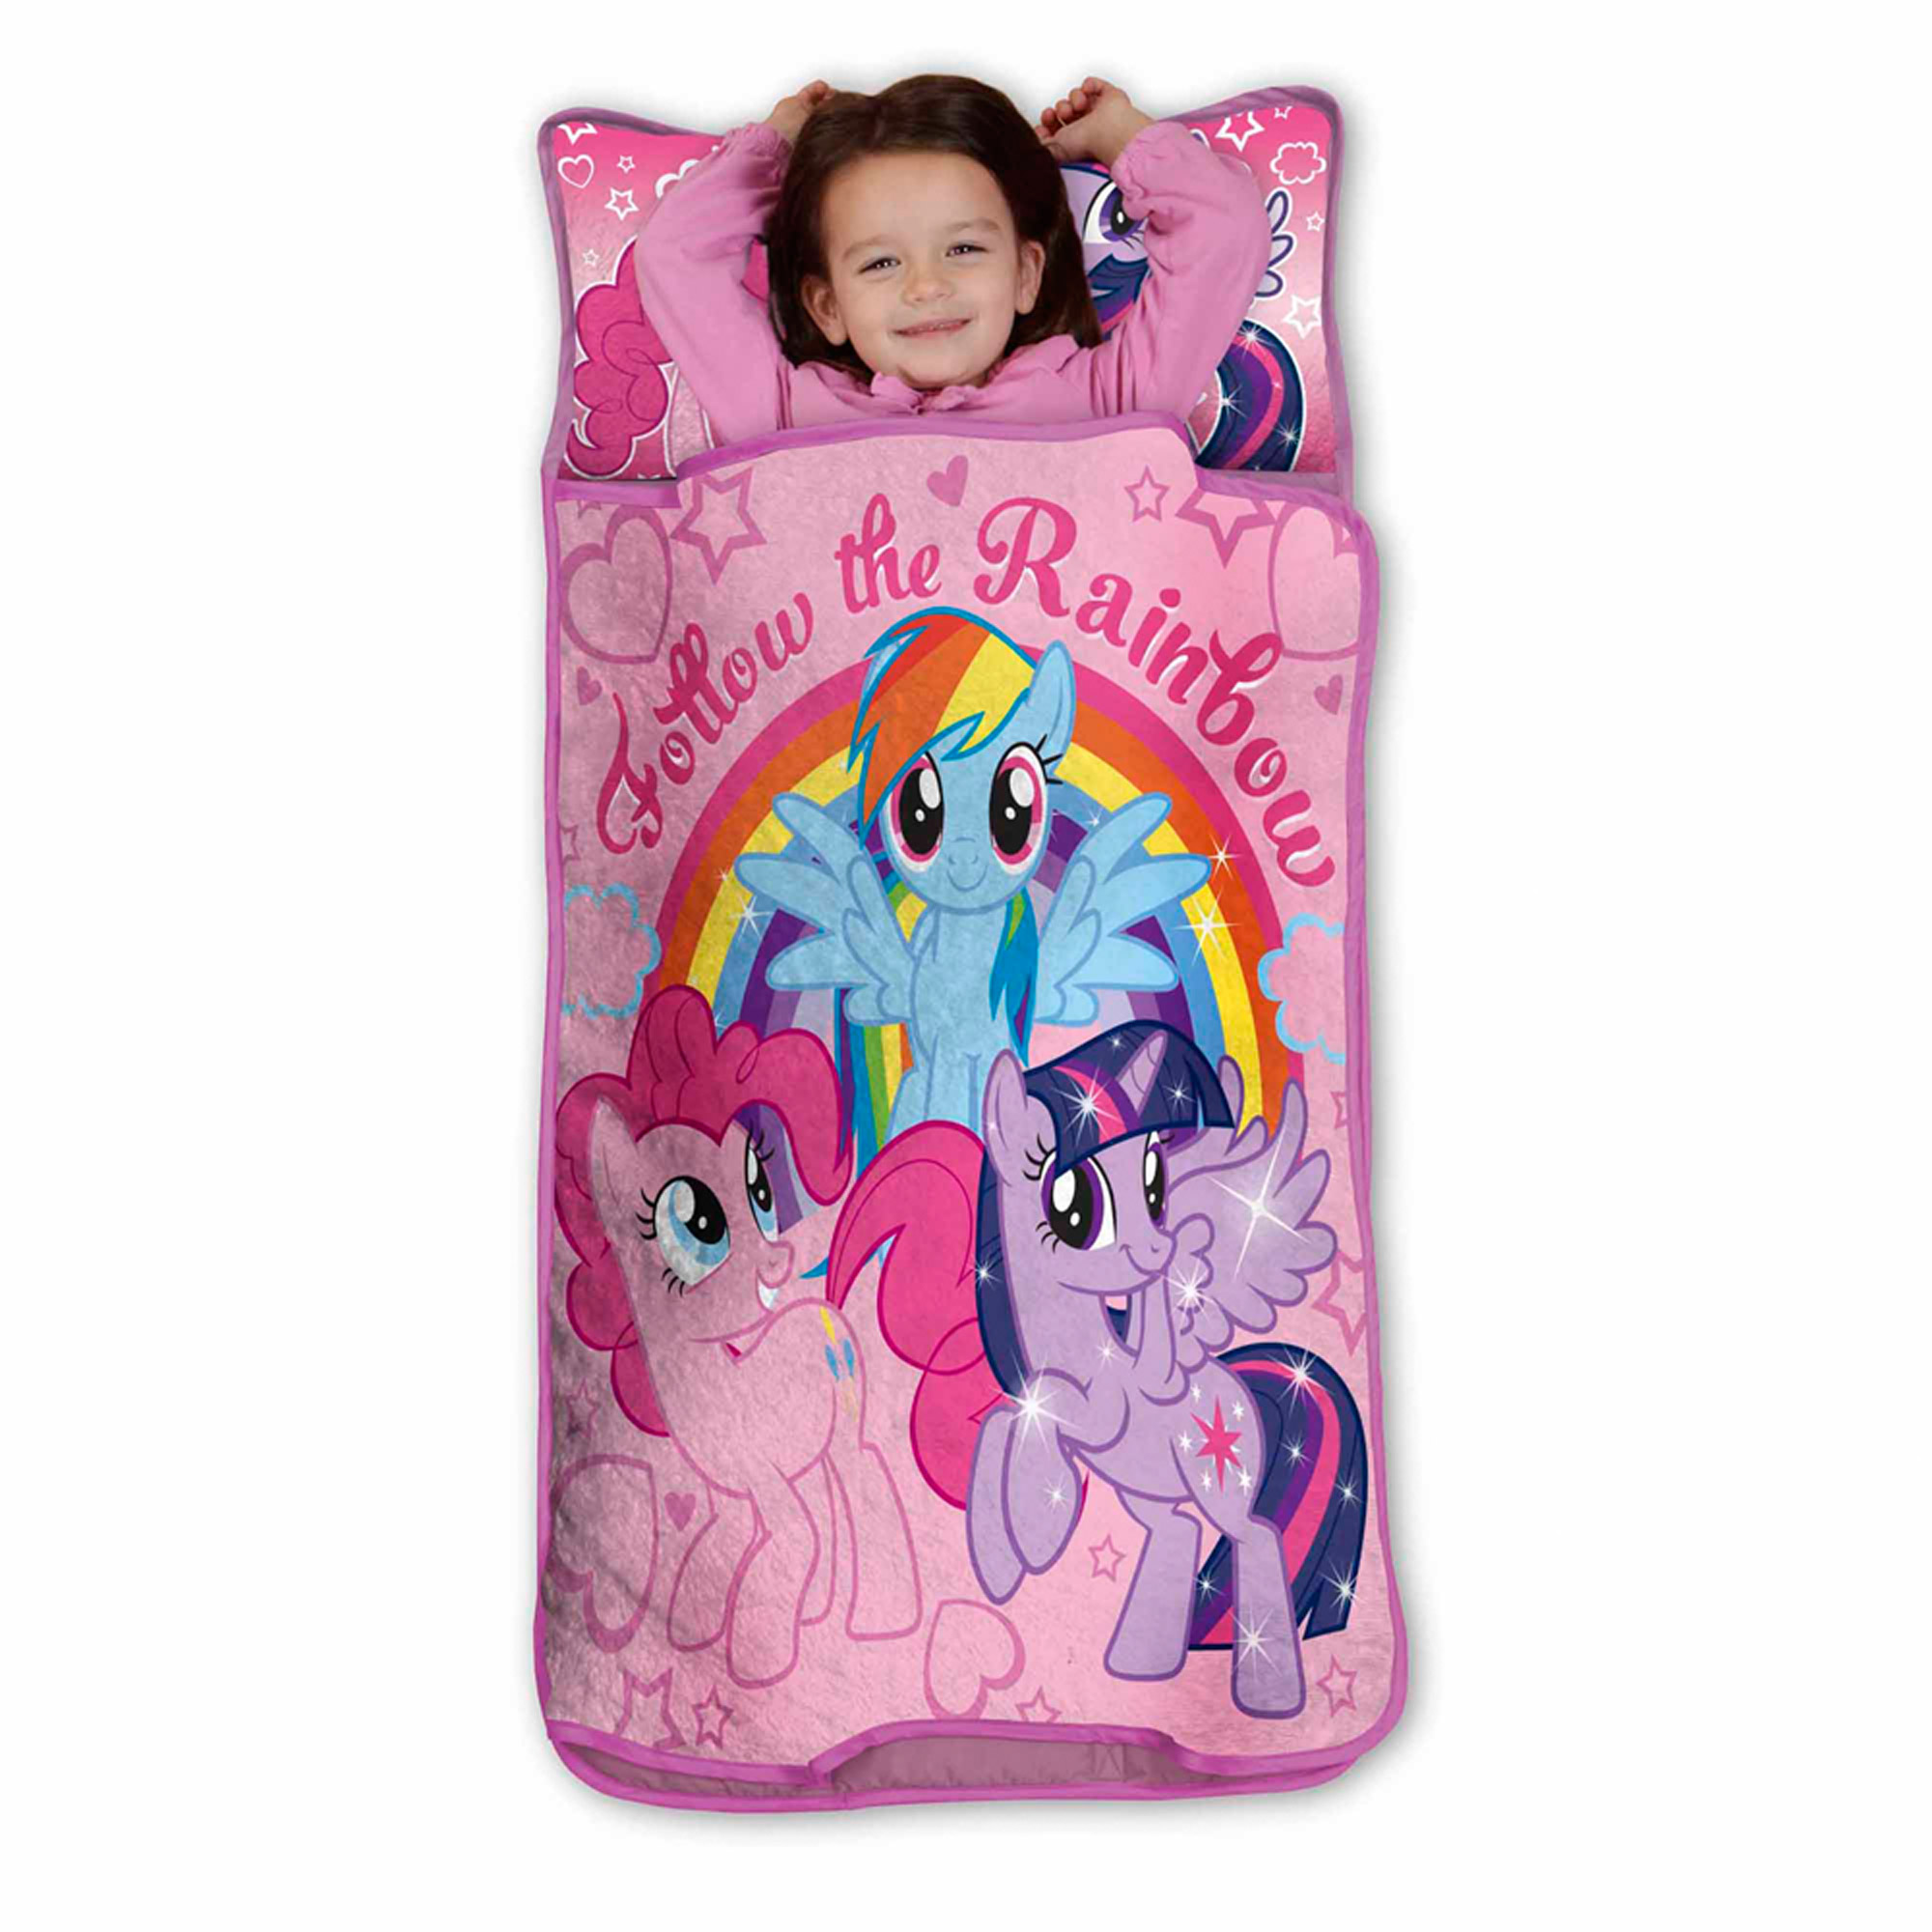 nap on alibaba mat buy com pillow blanket set explorer in toddler cheap pink mats girls for shop pin price dora toddlers